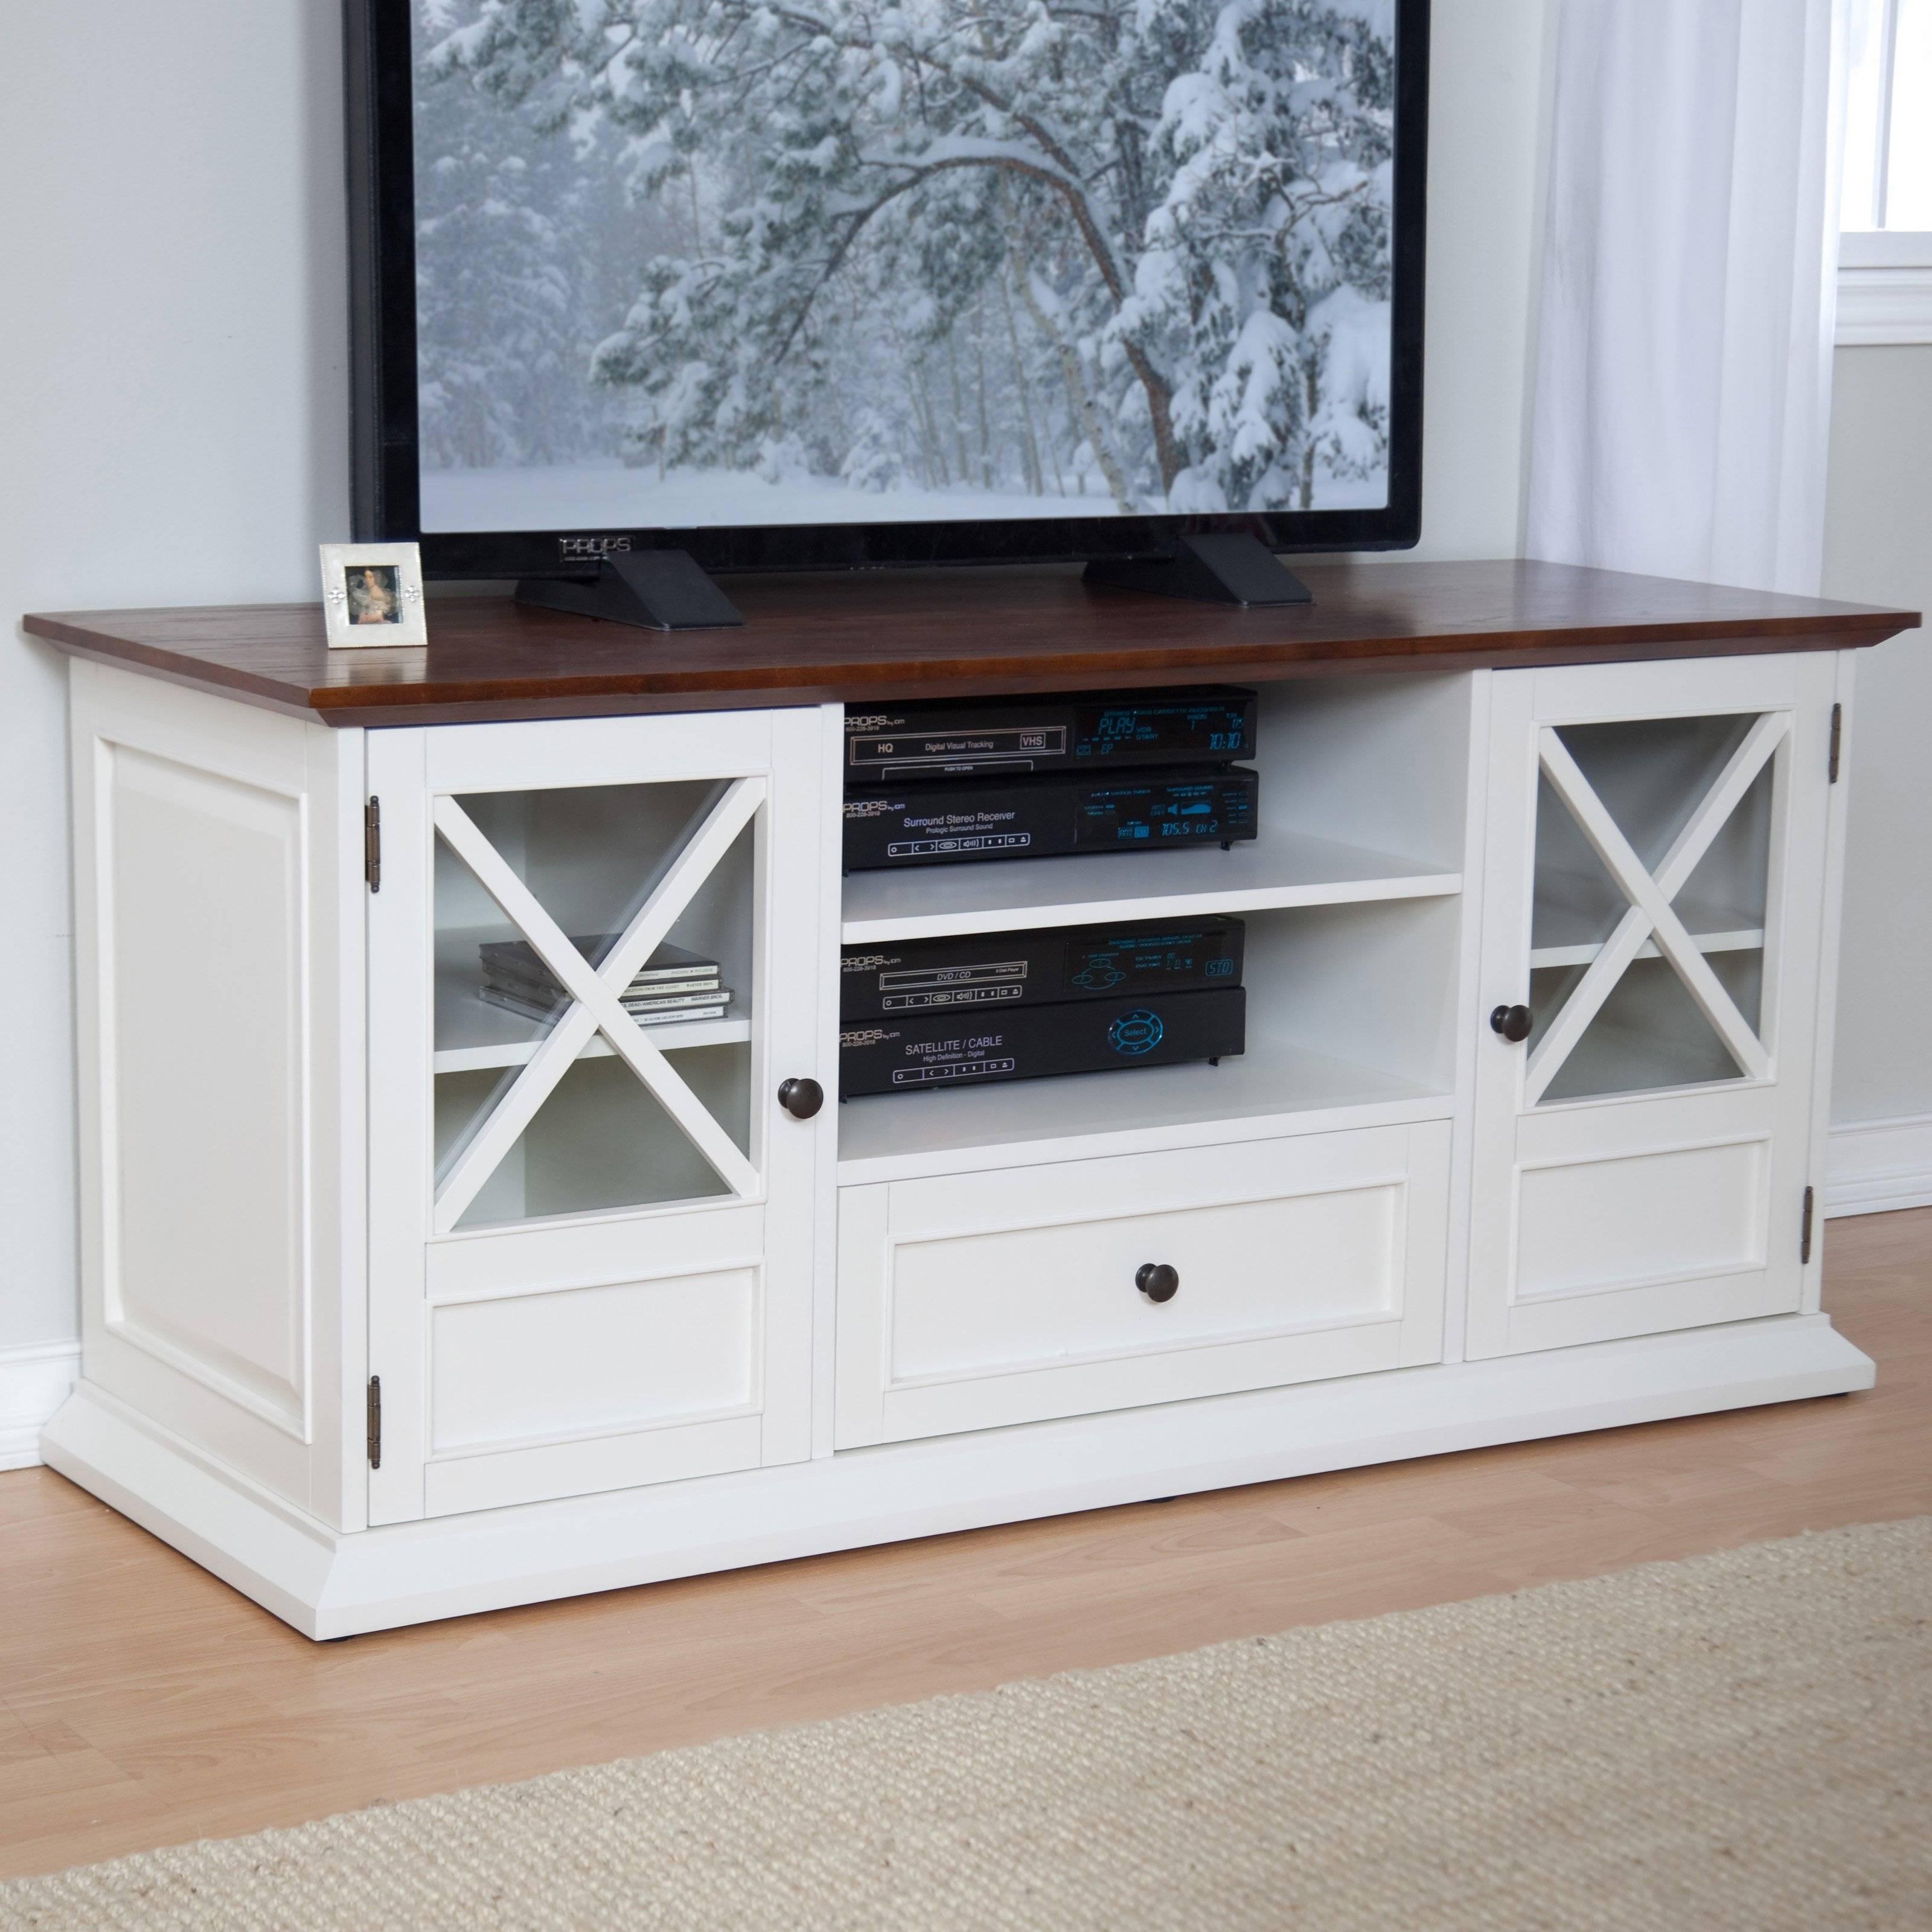 Belham Living Hampton Tv Stand – White/oak | Hayneedle Pertaining To Sideboard Tv Stand (#6 of 20)